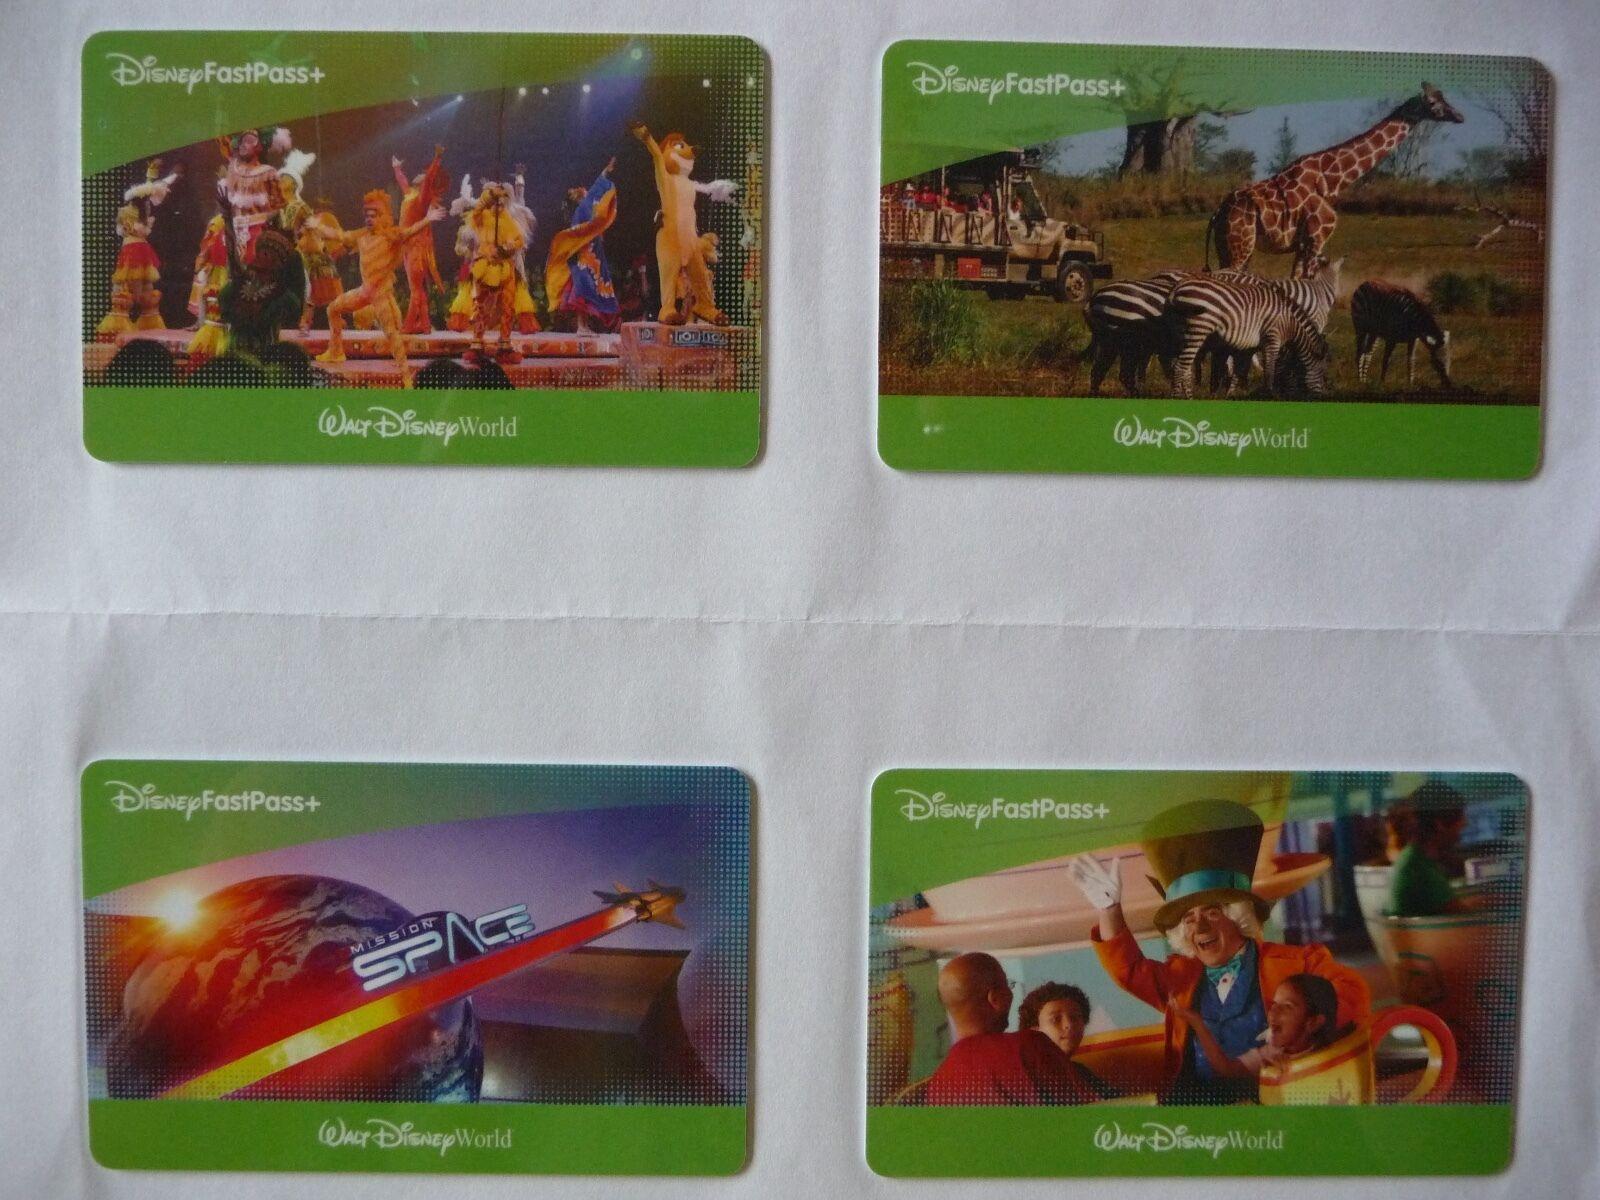 One (1) Day Park Hopper Ticket/Pass - Disney World, Magic Kingdom, Epcot, etc.